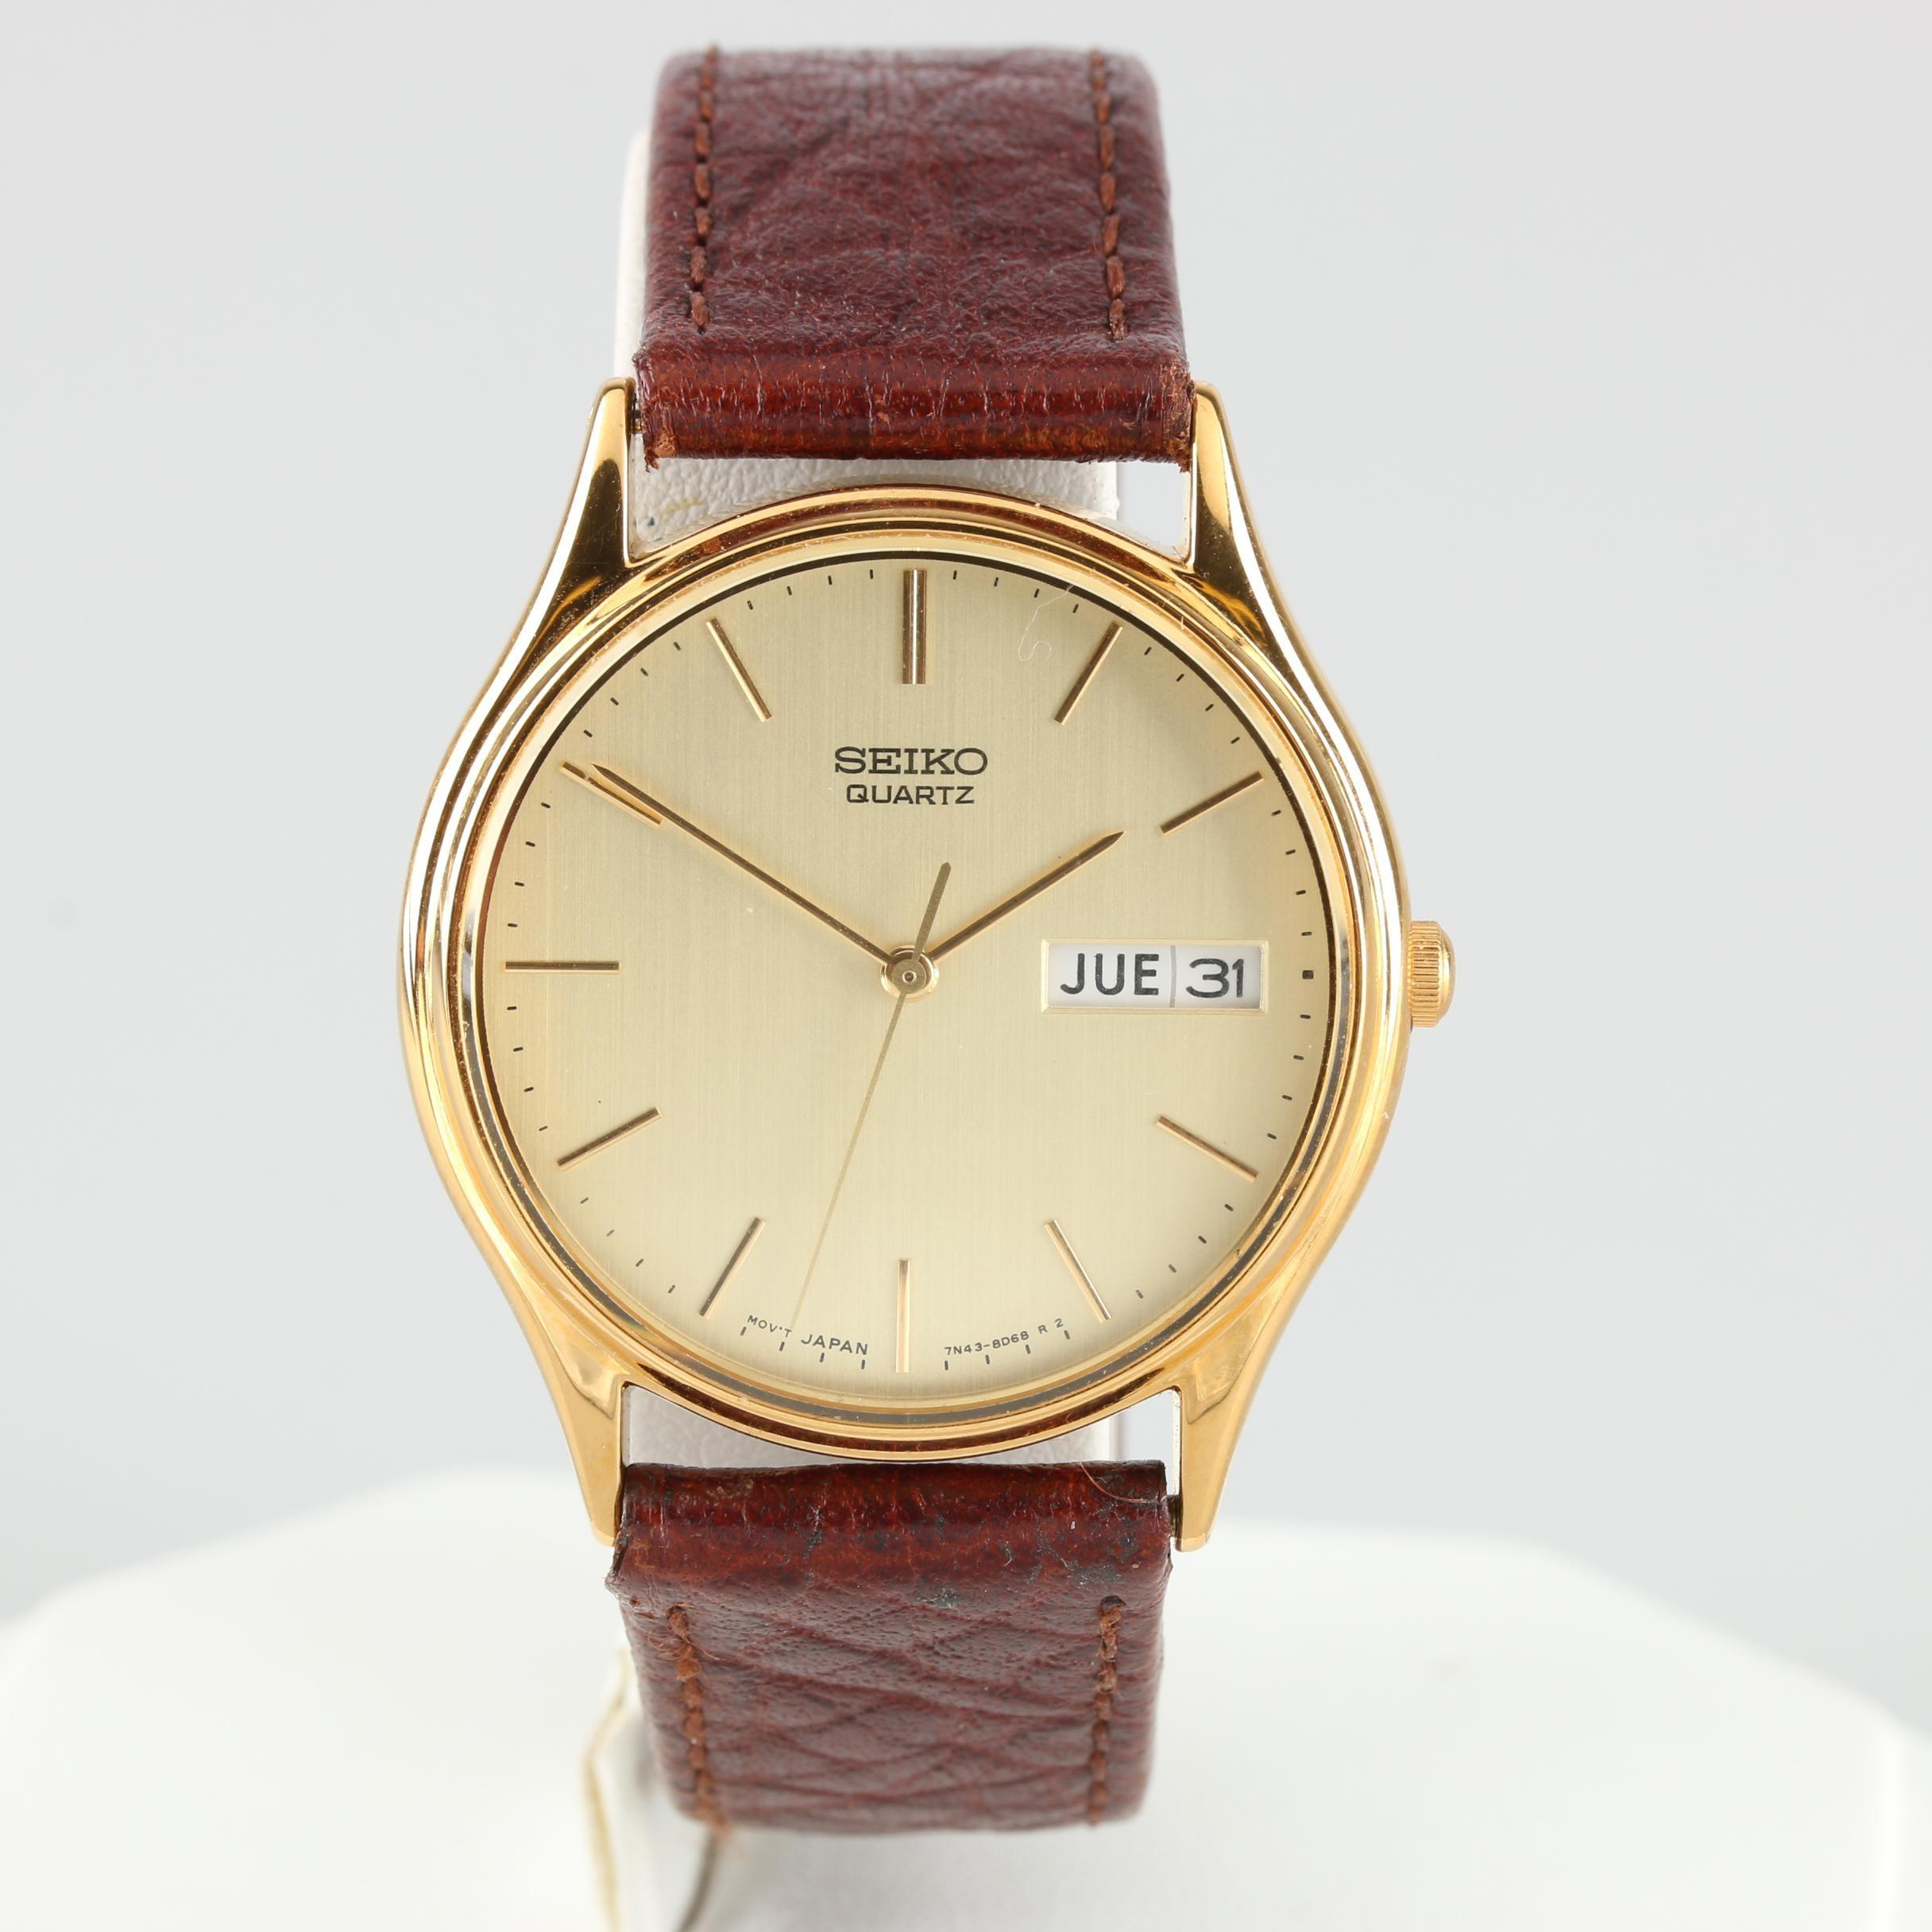 Seiko Gold Tone Quartz Day-Date Wristwatch